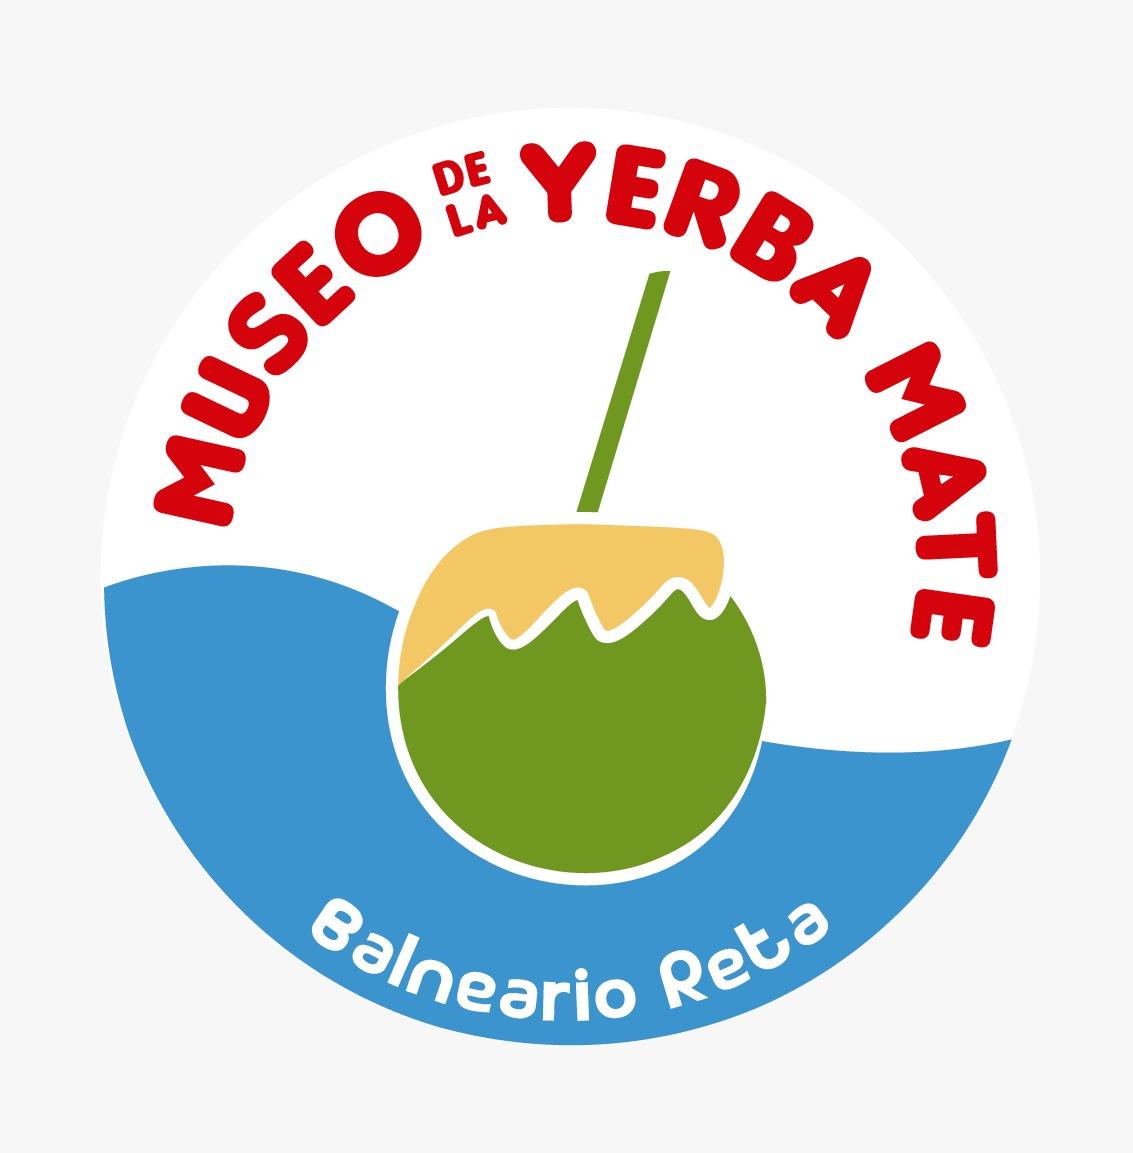 Circuito Yerba Mate : Mundo mate u rym ruta de la yerba mate